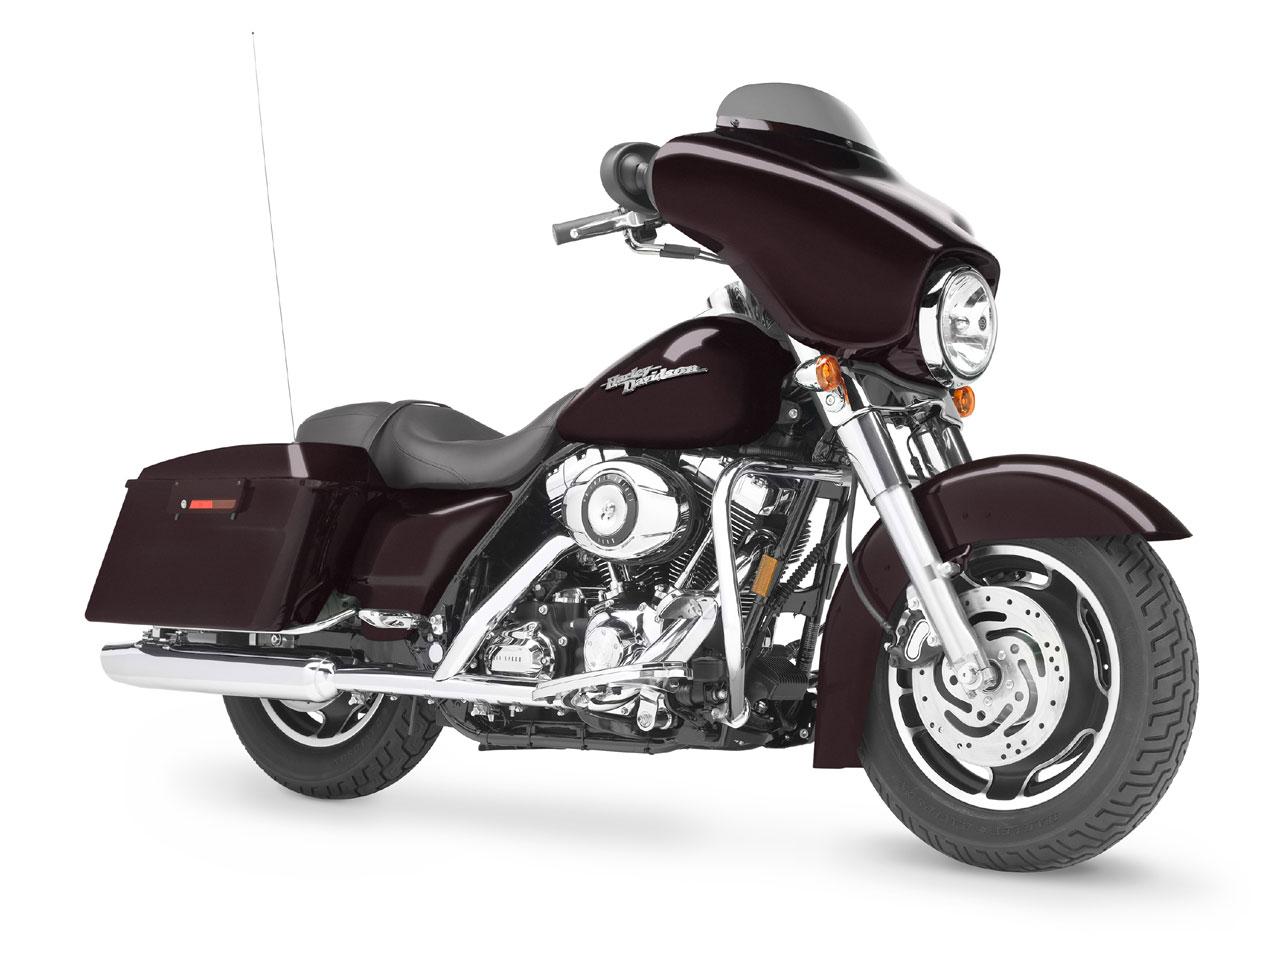 http://3.bp.blogspot.com/_B8Dh2WXNvg0/SwcpkrUPppI/AAAAAAAADuY/qtI5HEL2FCo/s1600/Harley-Davidson+FLHX+Street+Glide.jpg